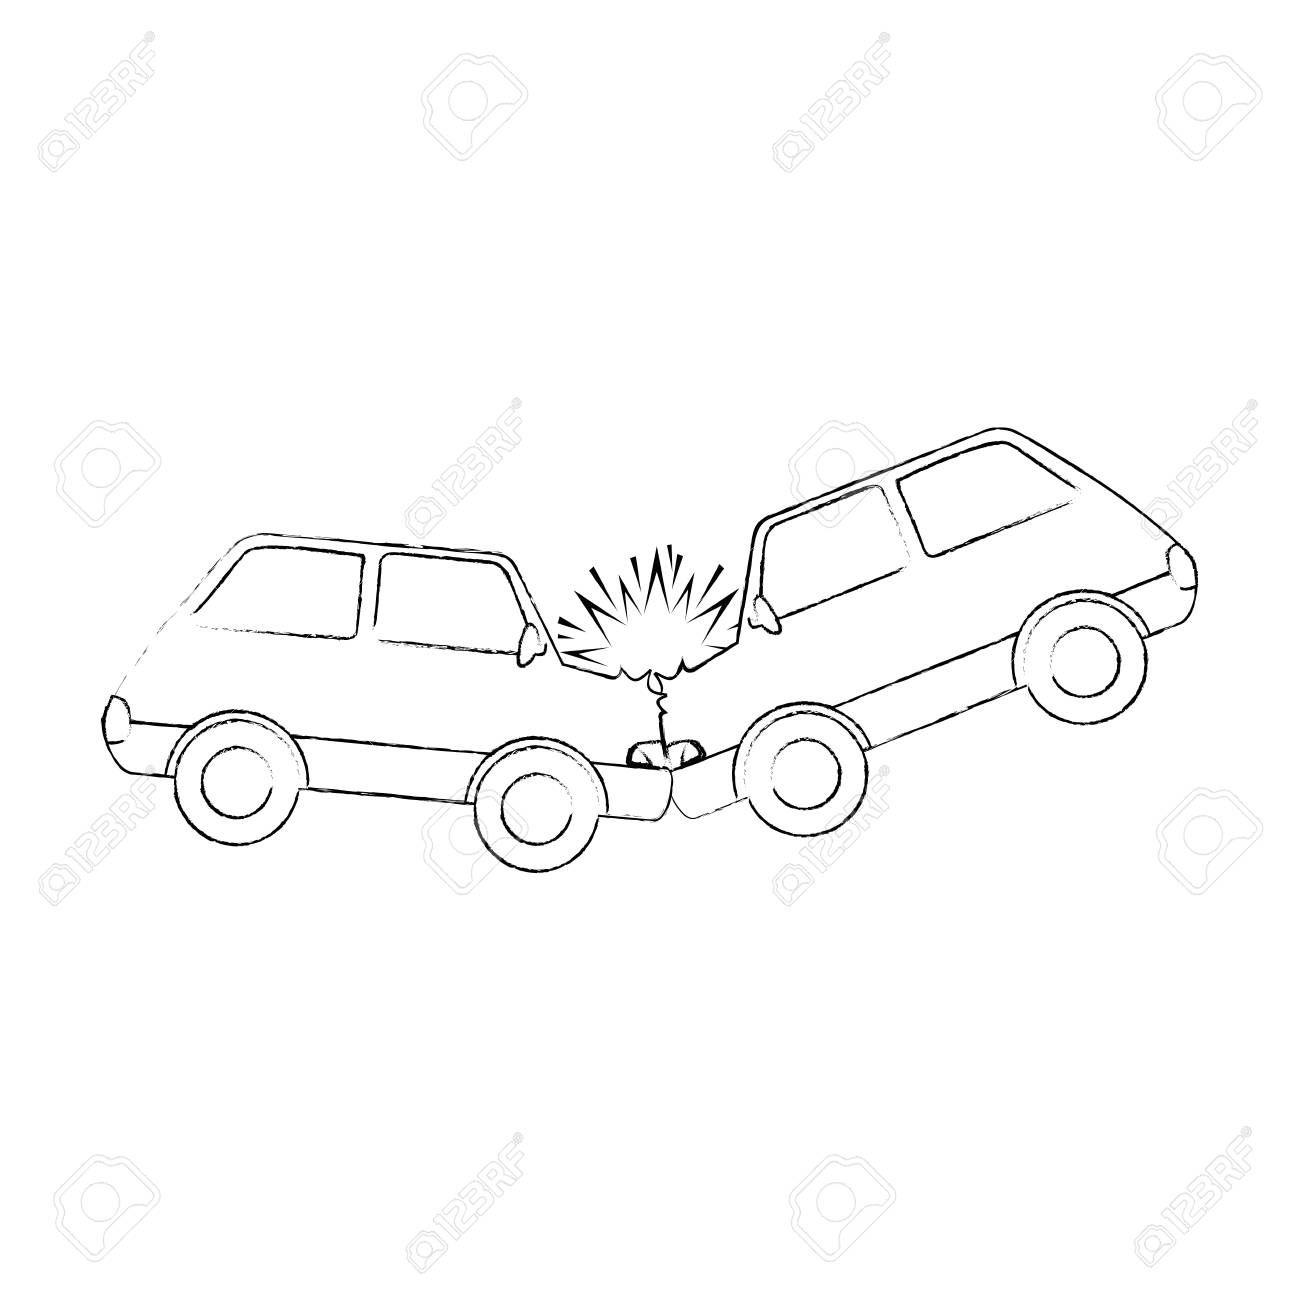 Cars Crash Accident Icon Vector Illustration Design Aff Accident Crash Cars Icon Desi Vector Illustration Design Guitar Illustration Guitar Sketch